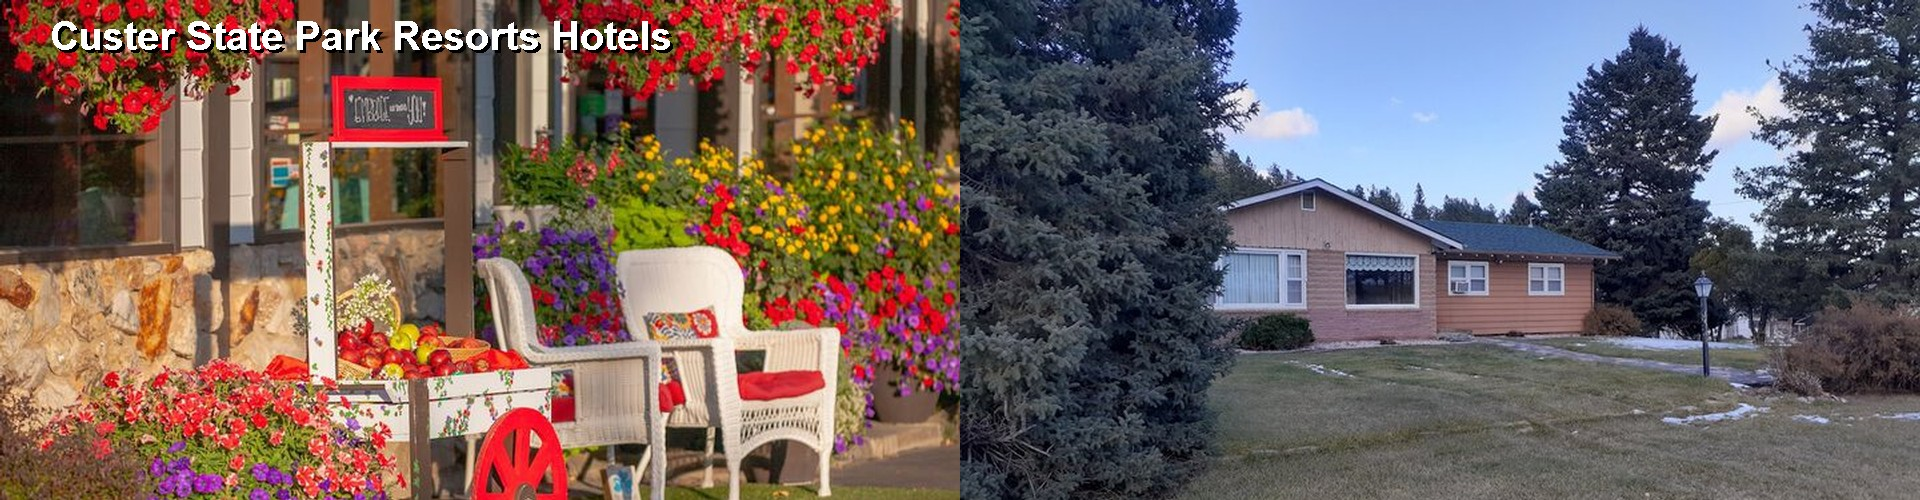 5 Best Hotels Near Custer State Park Resorts